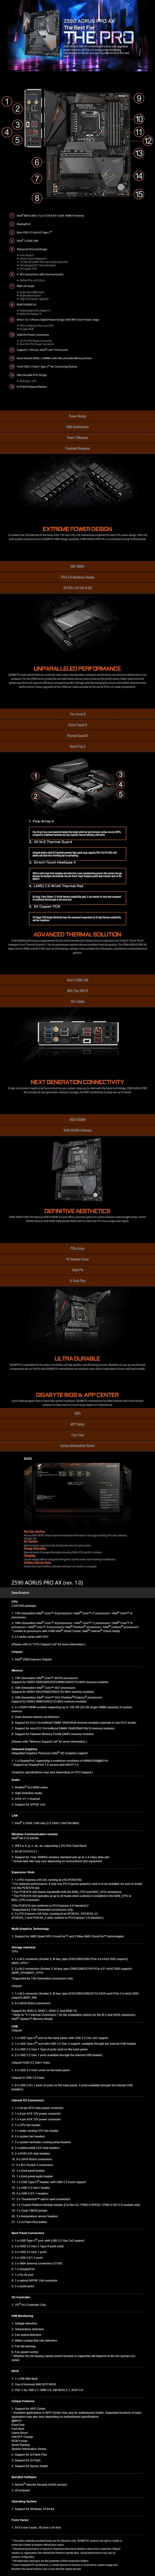 Gigabyte Z590 AORUS PRO AX LGA 1200 ATX Motherboard - Overview 1